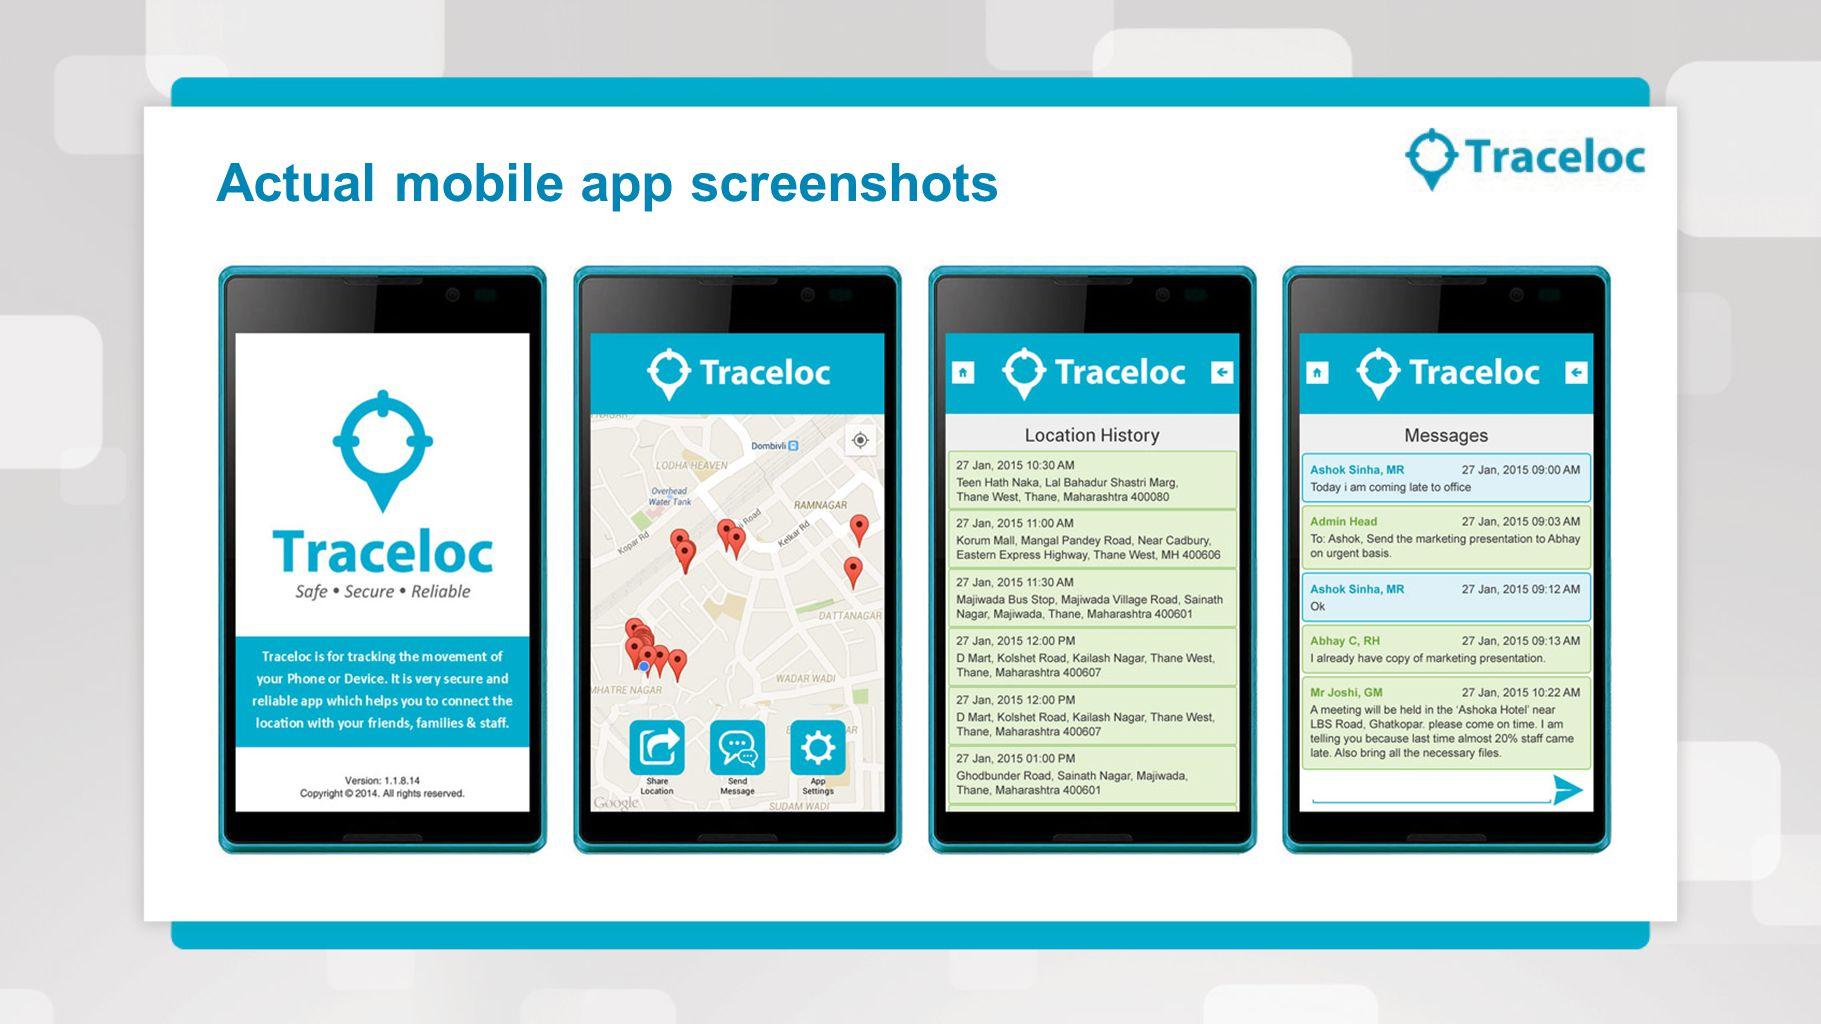 Actual mobile app screenshots